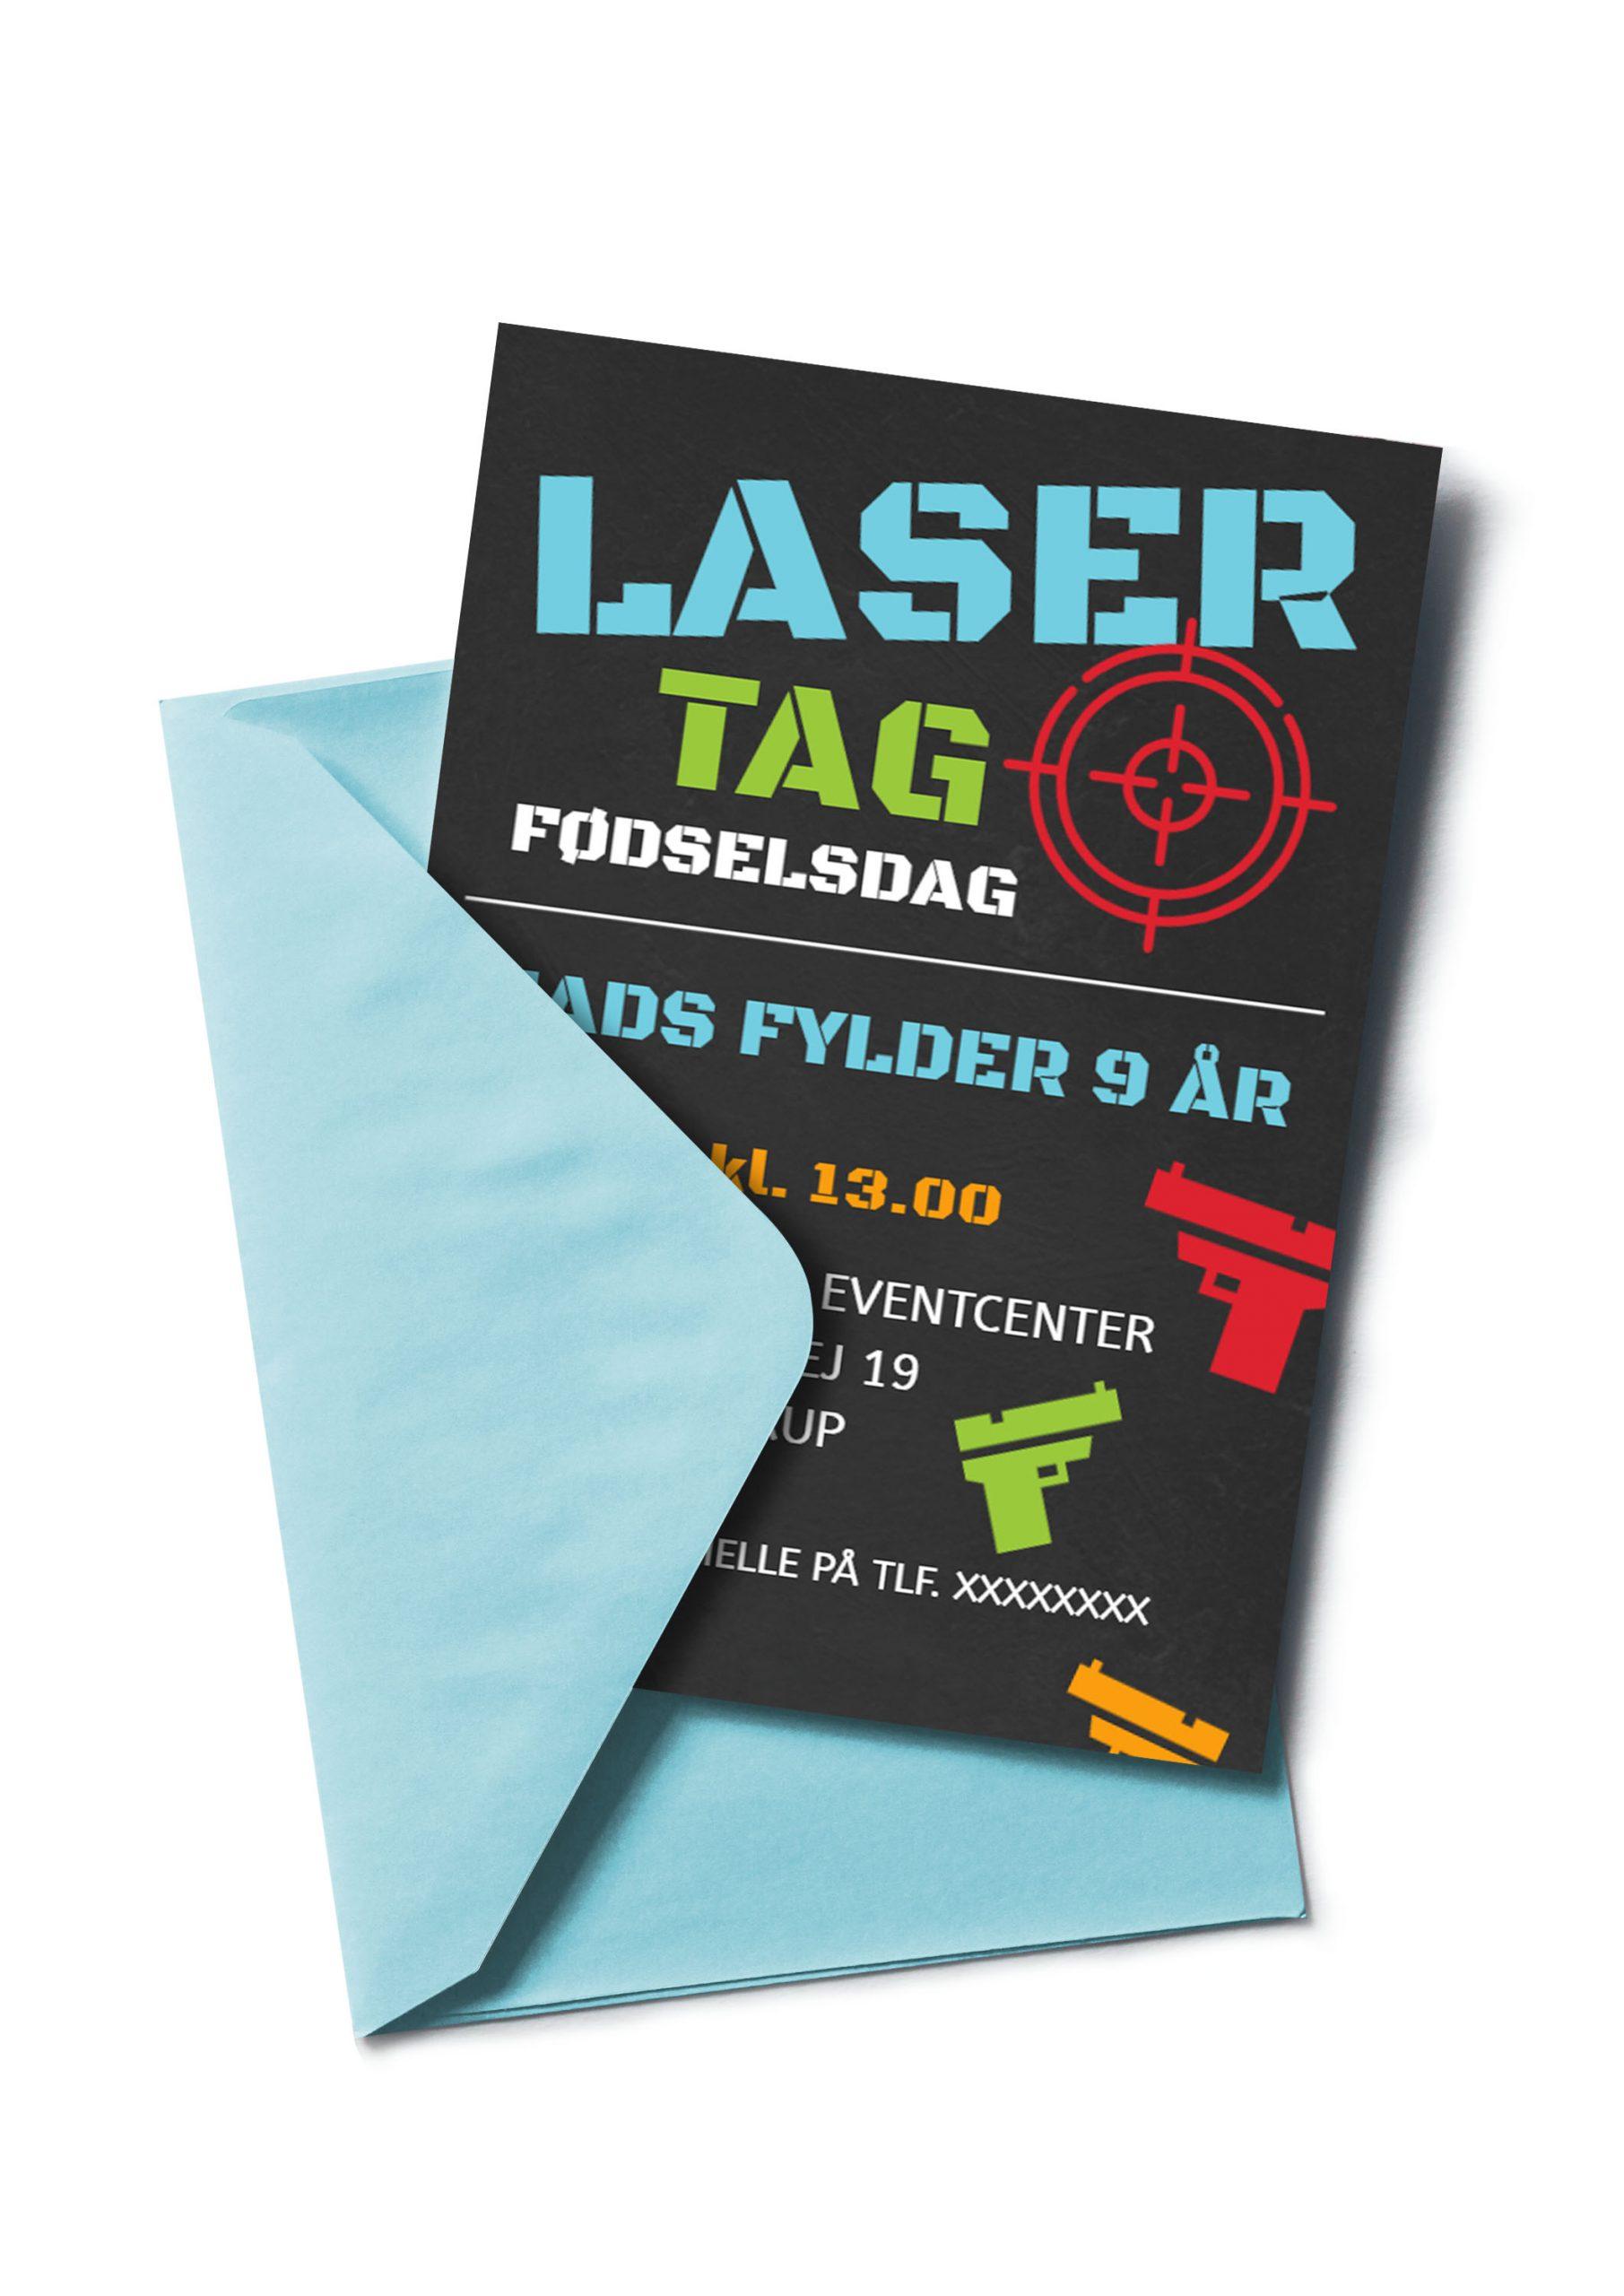 Lasertag invitation